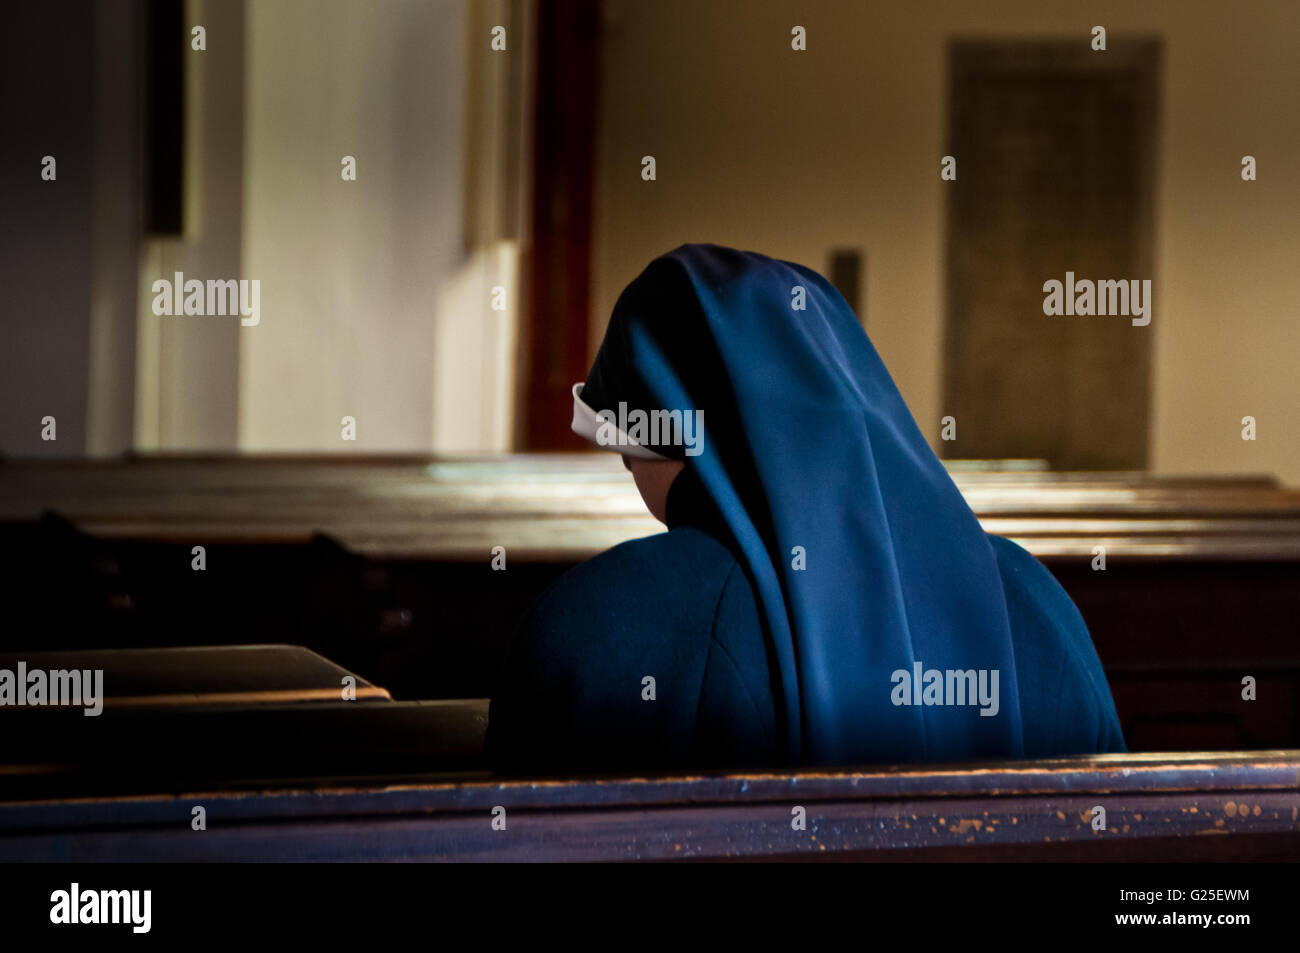 nun sitting in a church praying - Stock Image